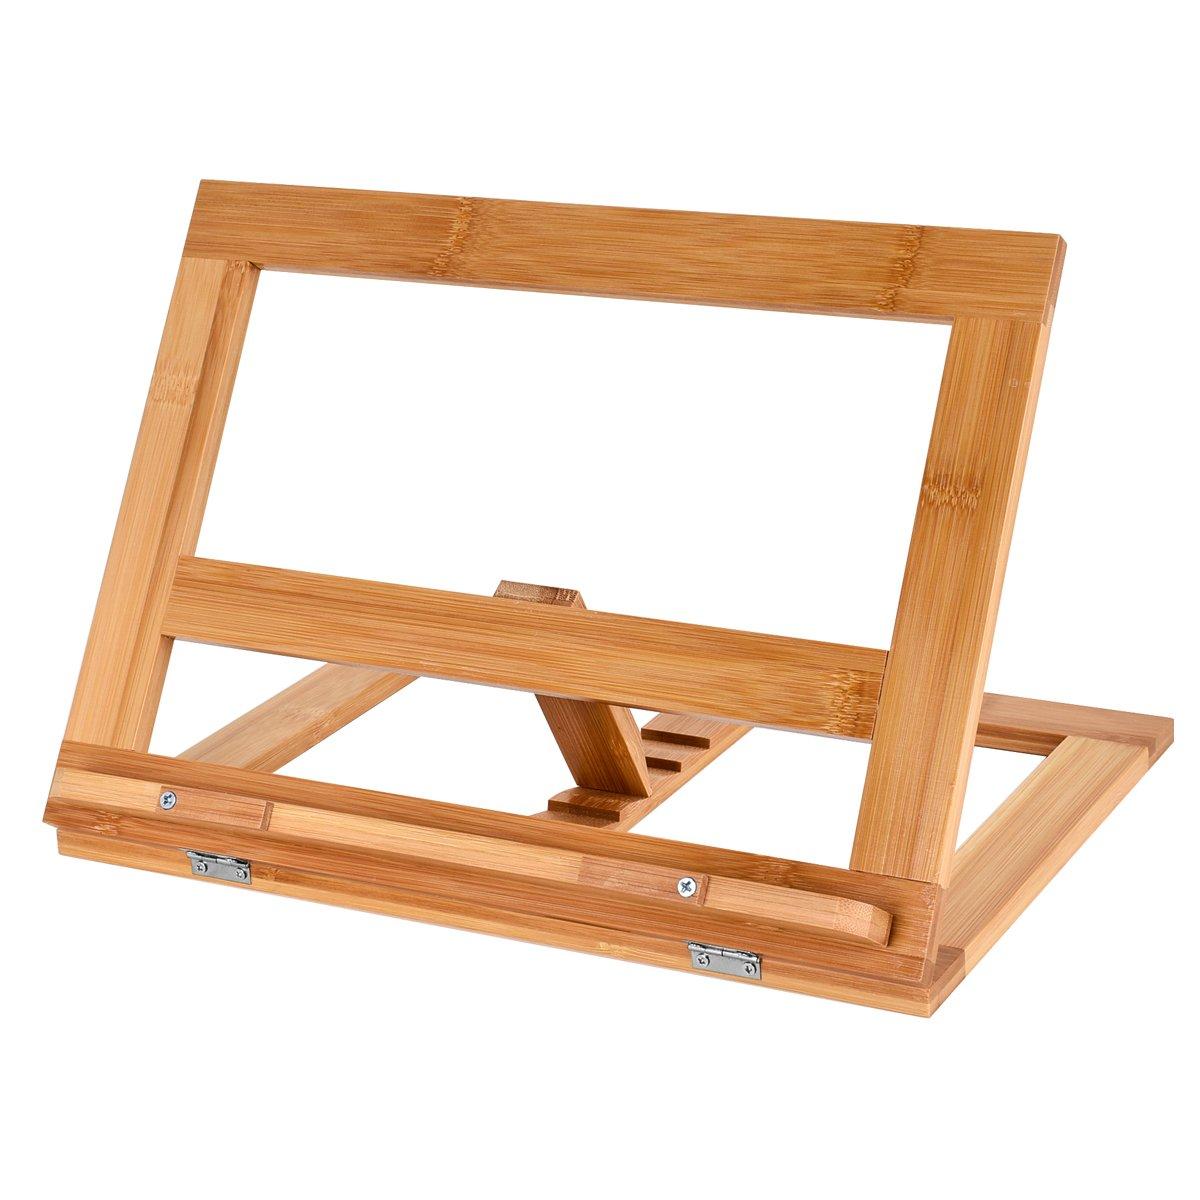 Tgg Premium Bamboo Book Stand, Natural Wooden Book Holder,Foldable Adjustable bookrest, Multipurpose Portable bookstands for Cookbook, Music Book, iPad.